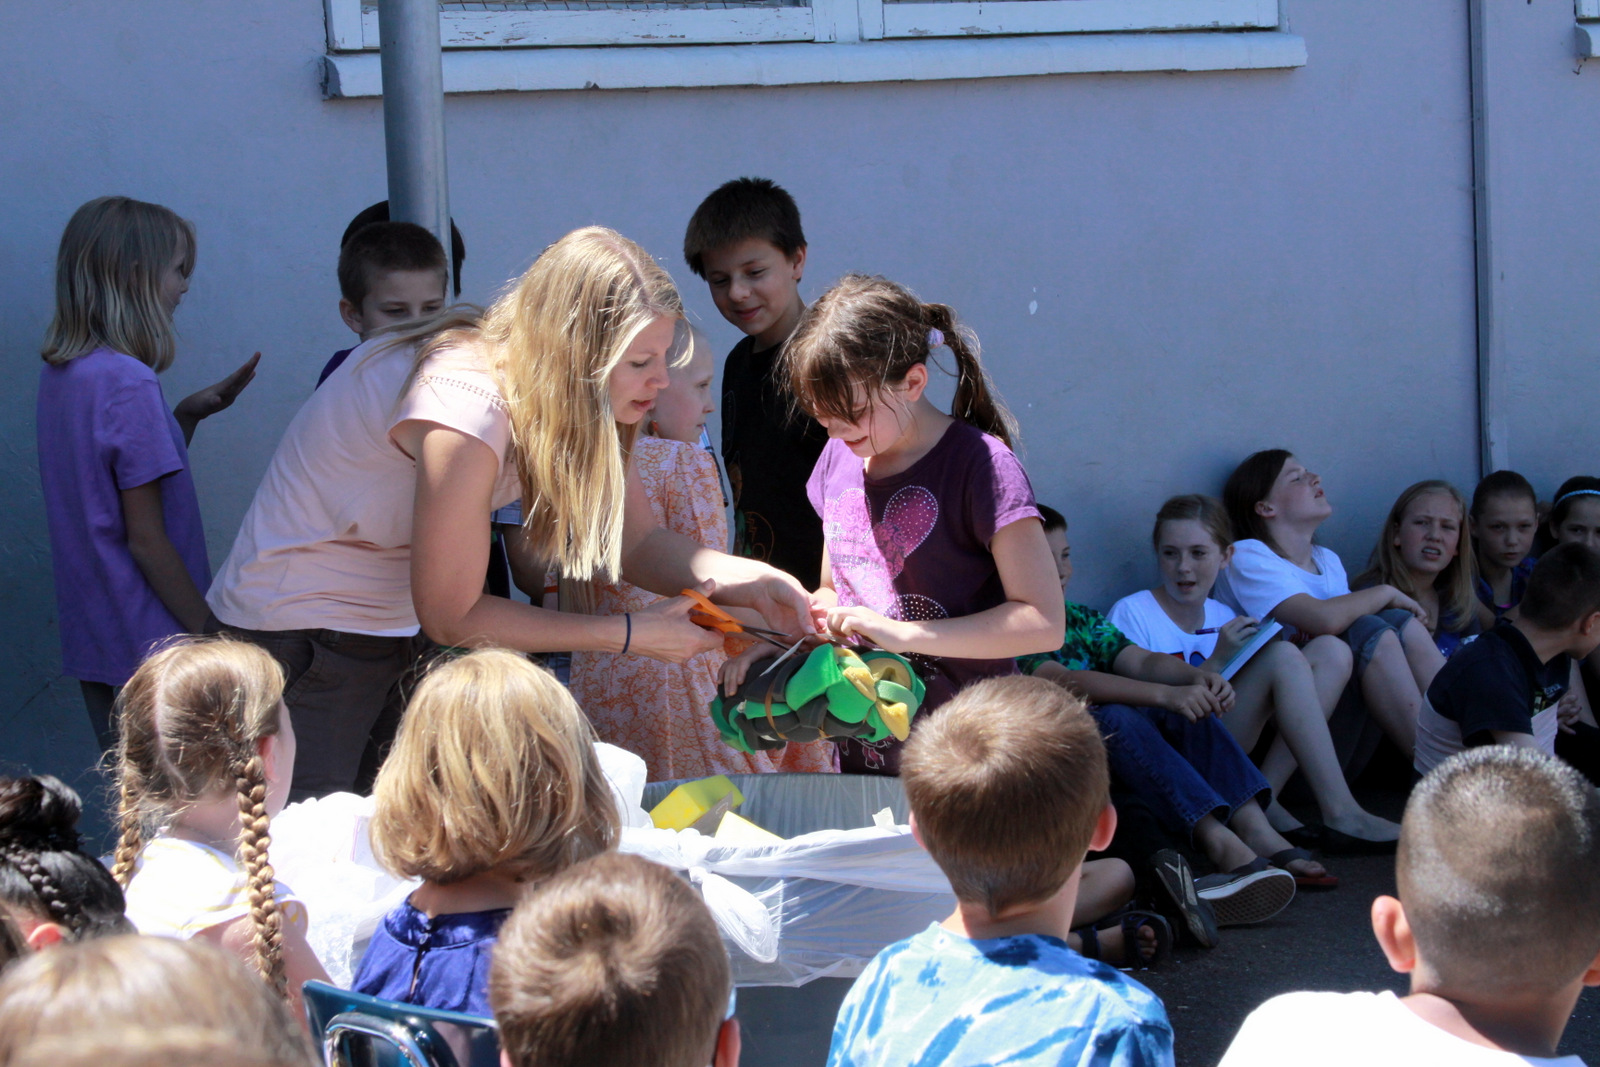 Egg Drop 3rd Grade Butte Creek Elementary School